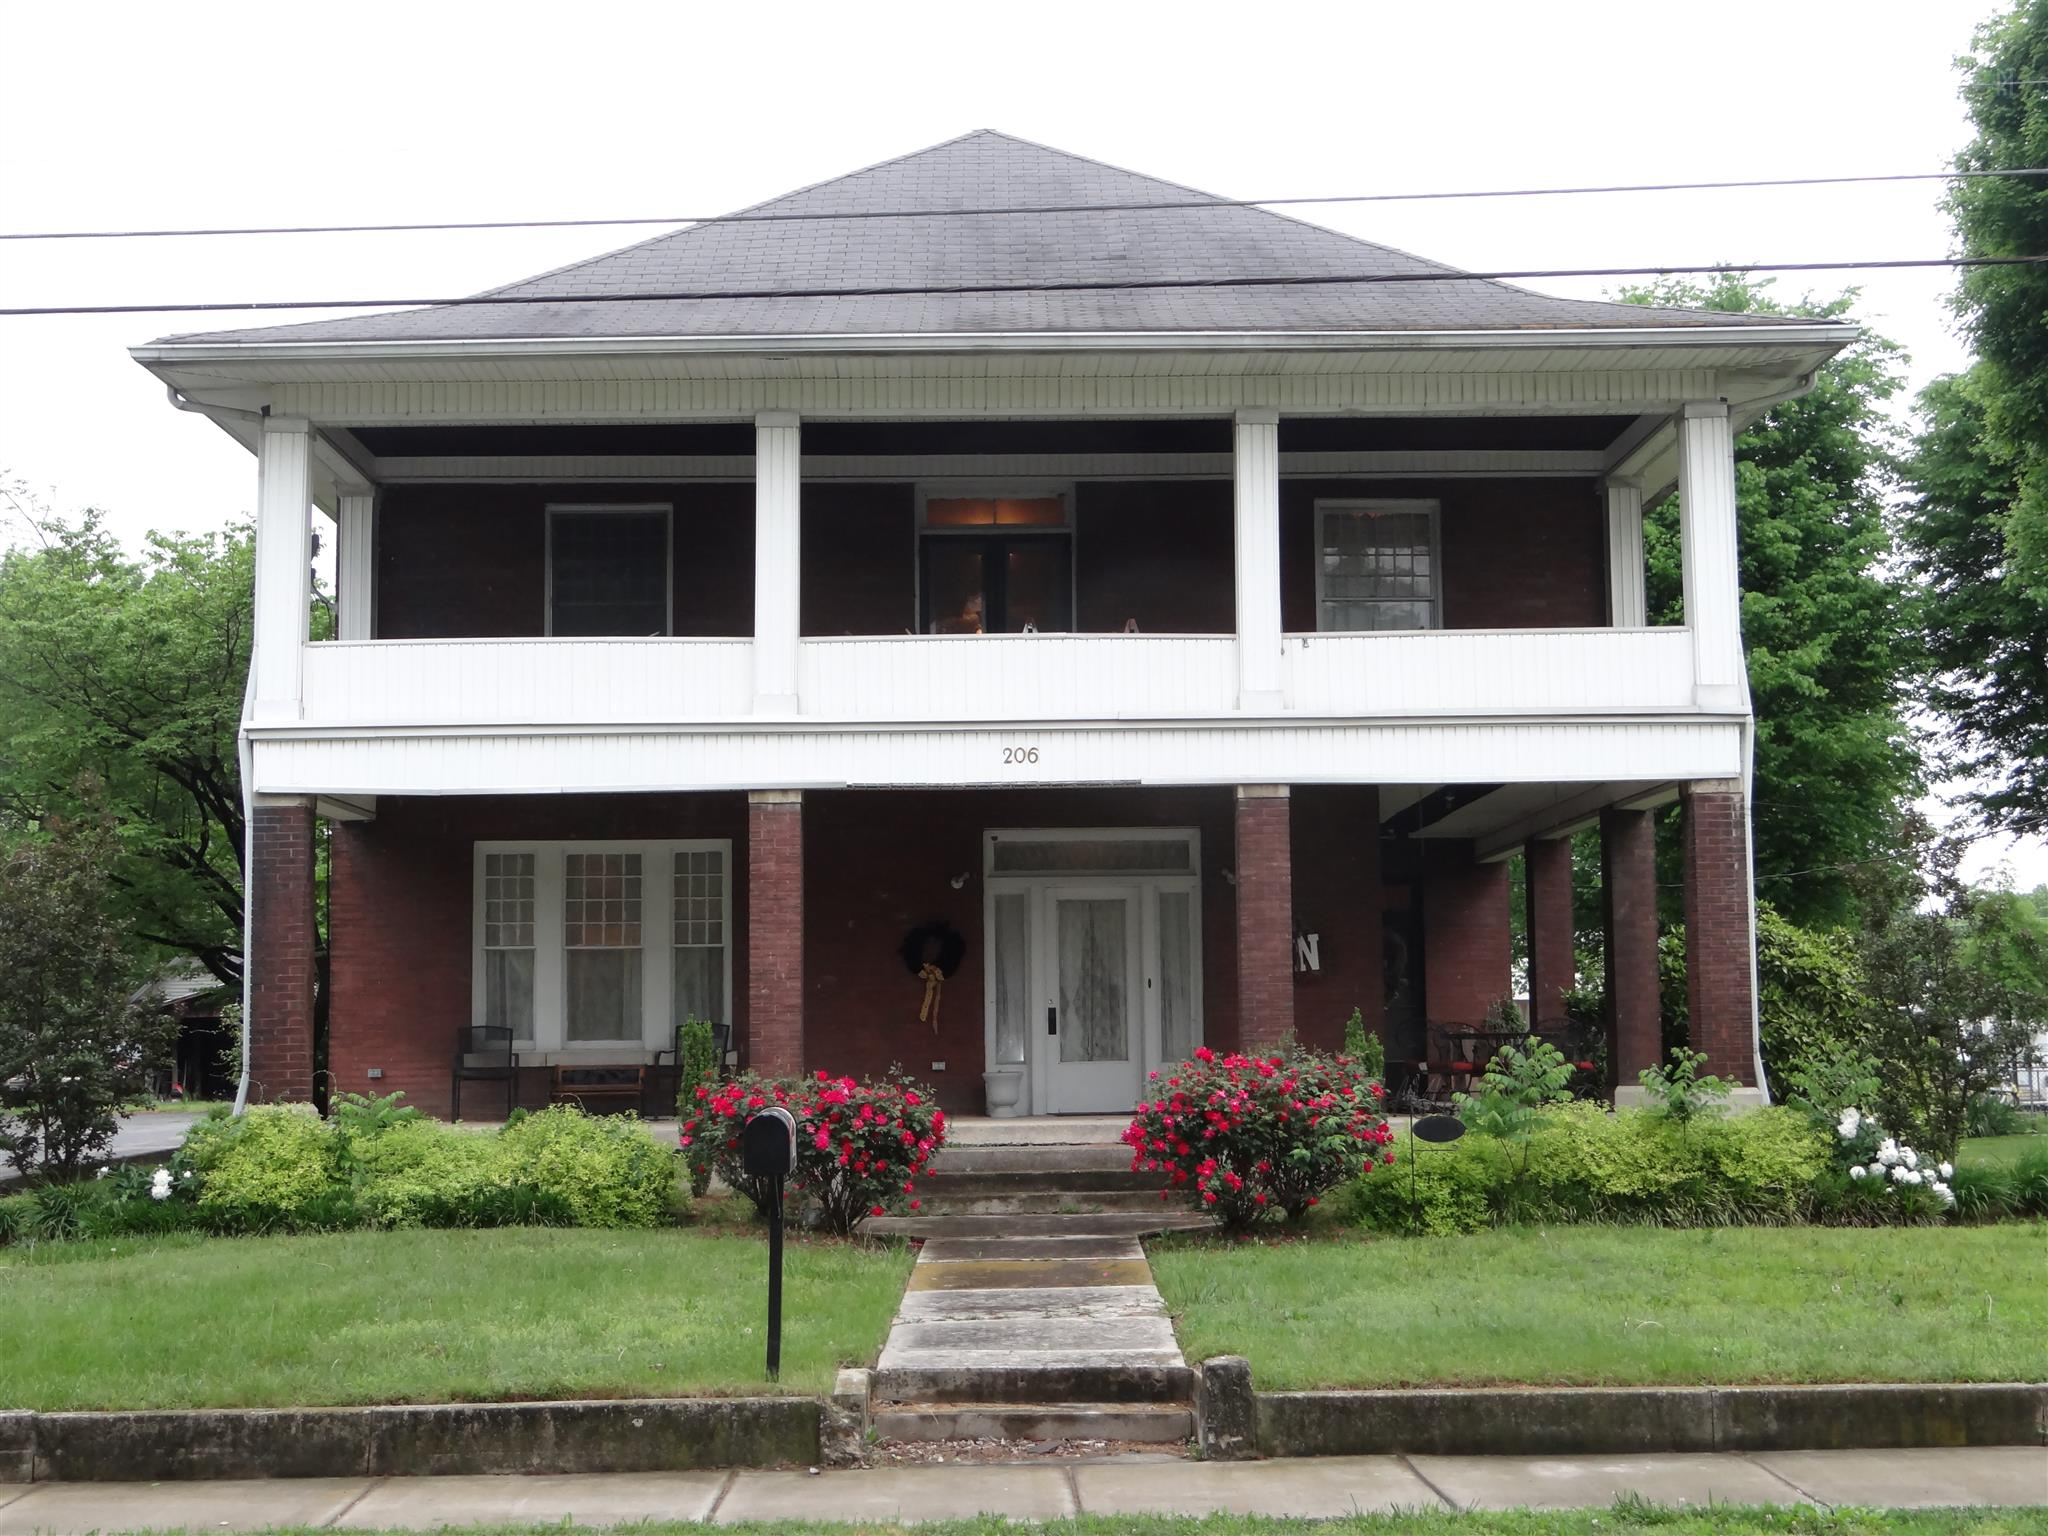 206 S Main St, Mount Pleasant, TN 38474